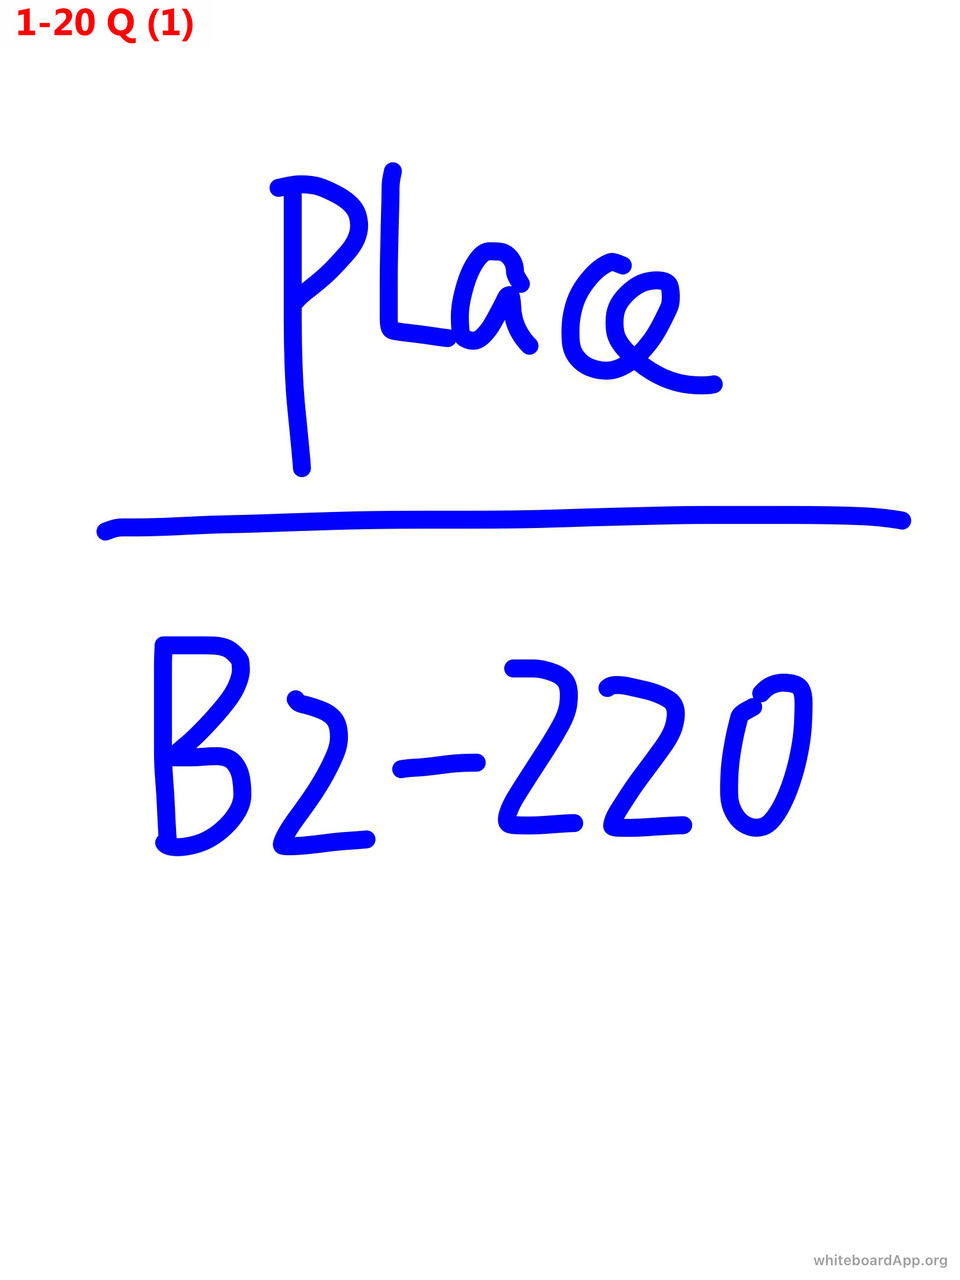 1-20 Q (1)